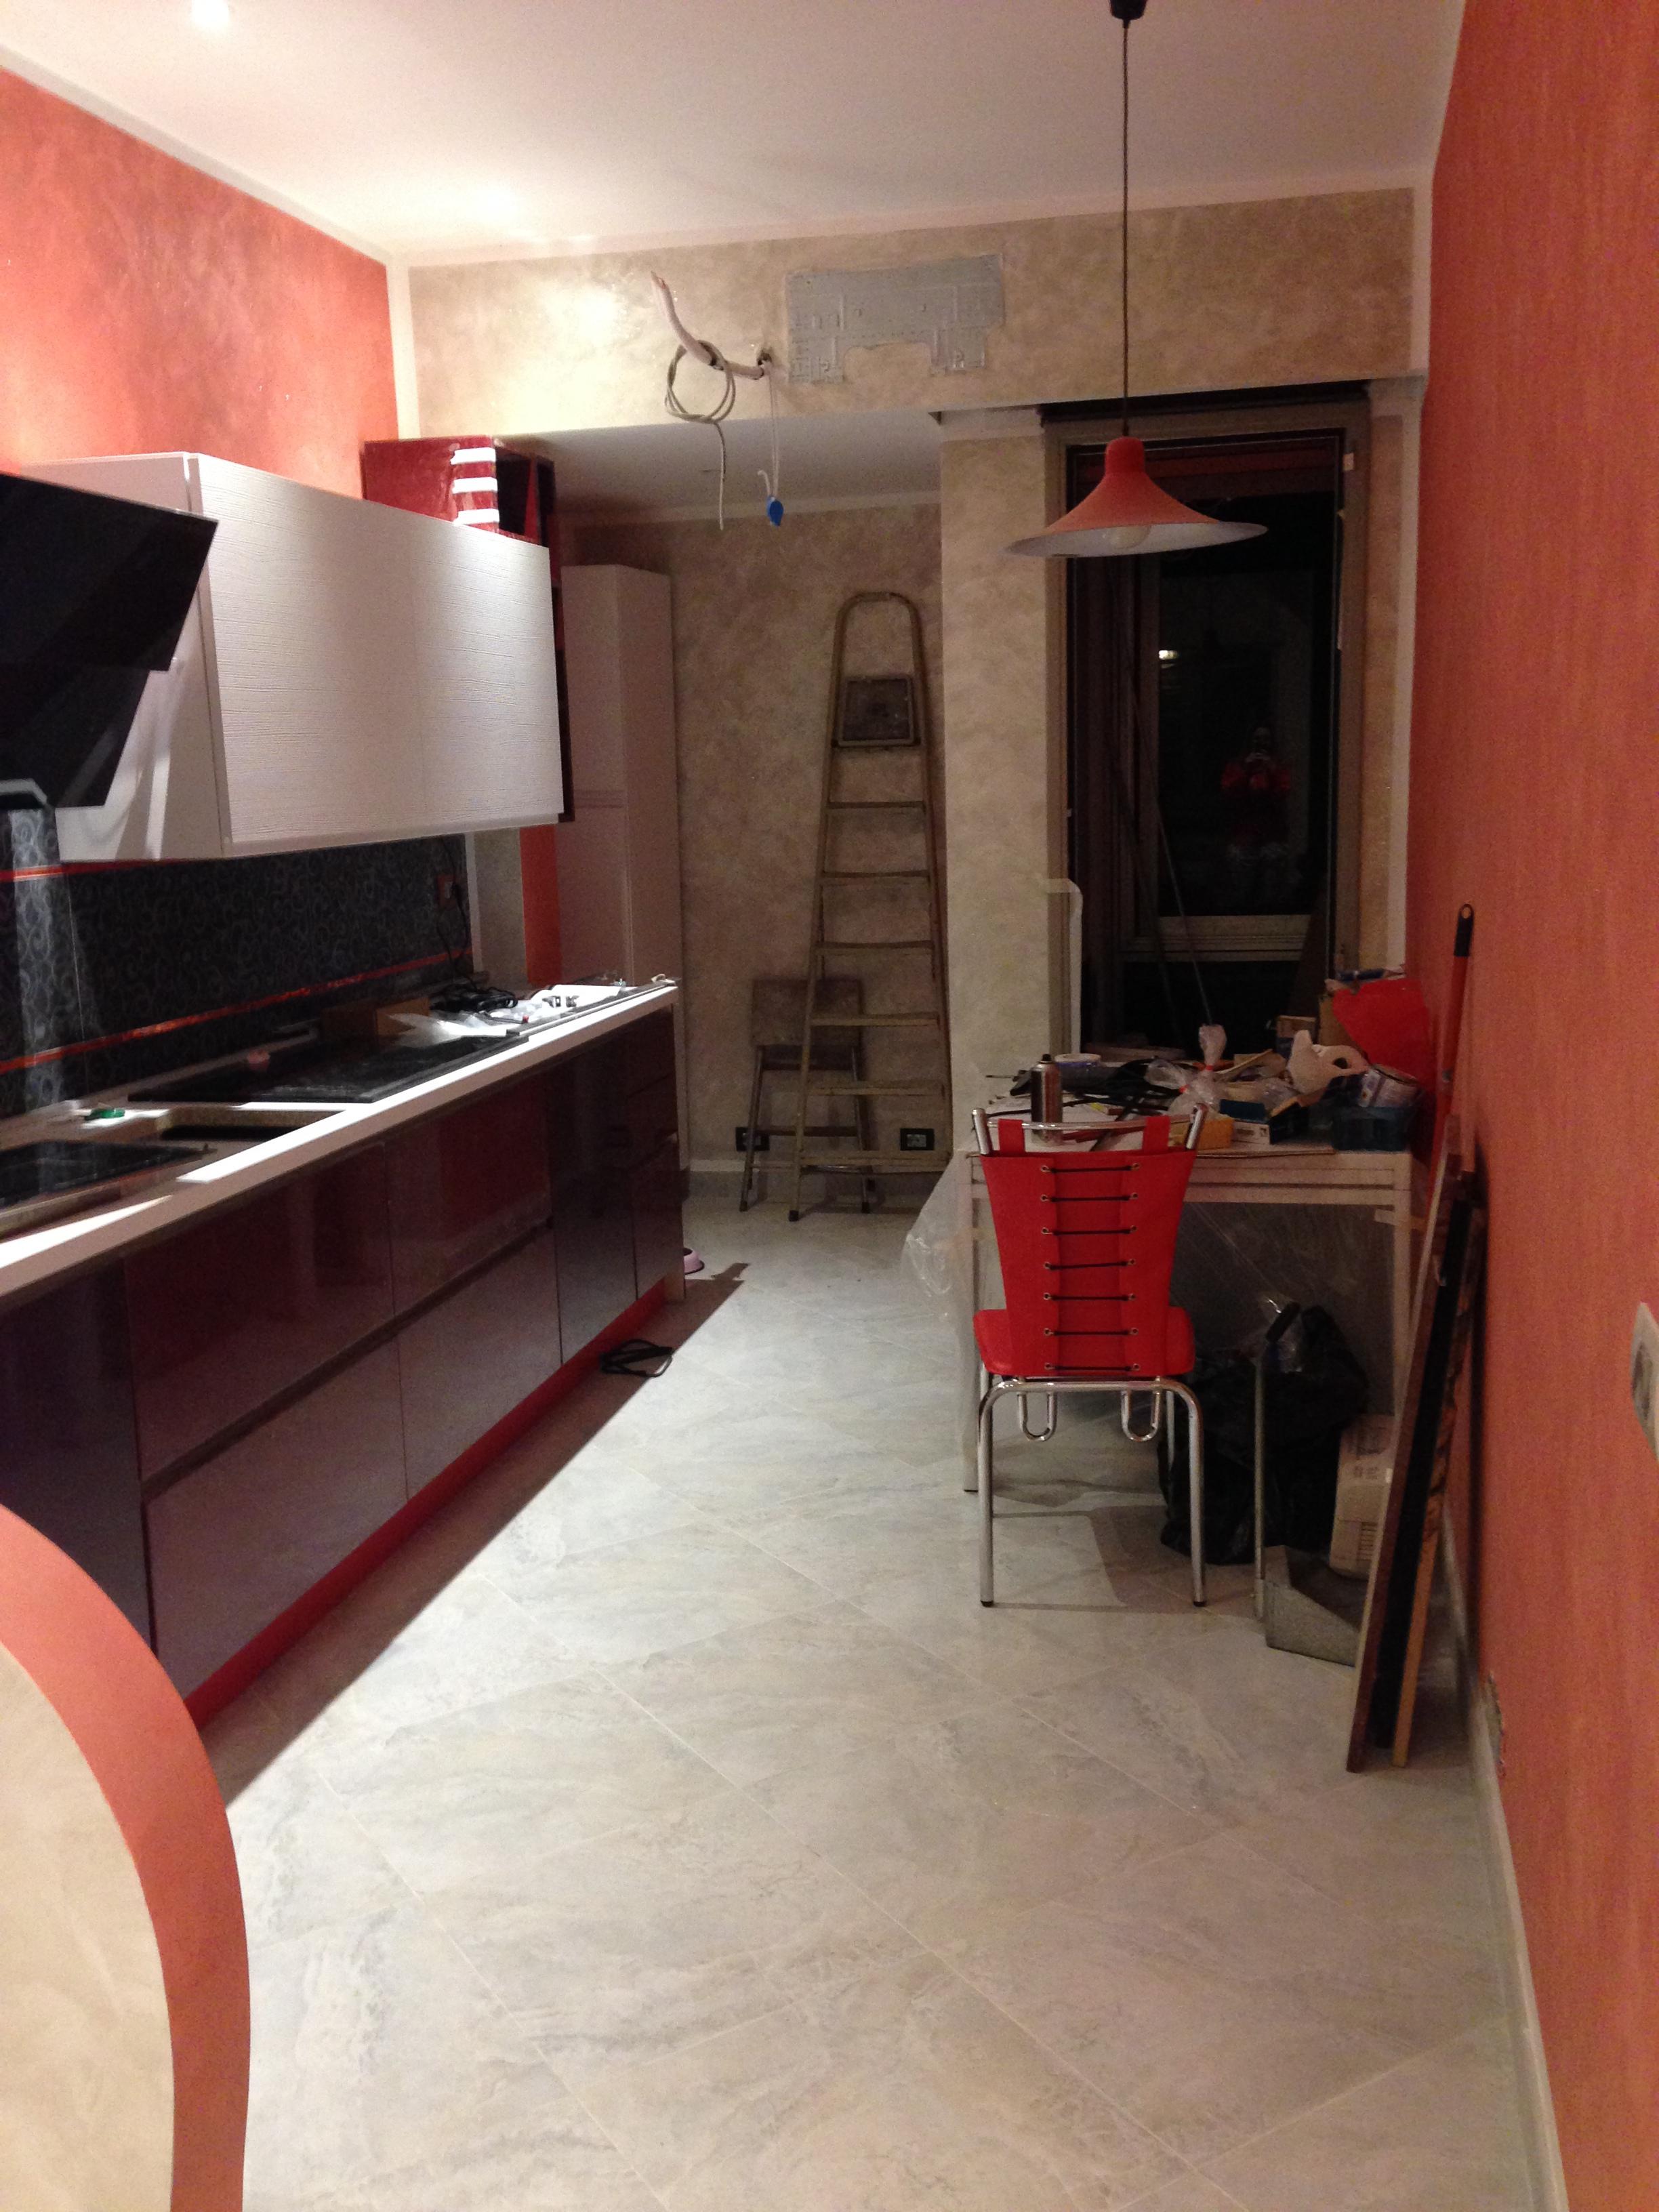 Ristrutturazione Cucina Roma, Ristrutturazione Cucina Milano, Ristrutturazione Cucina ...